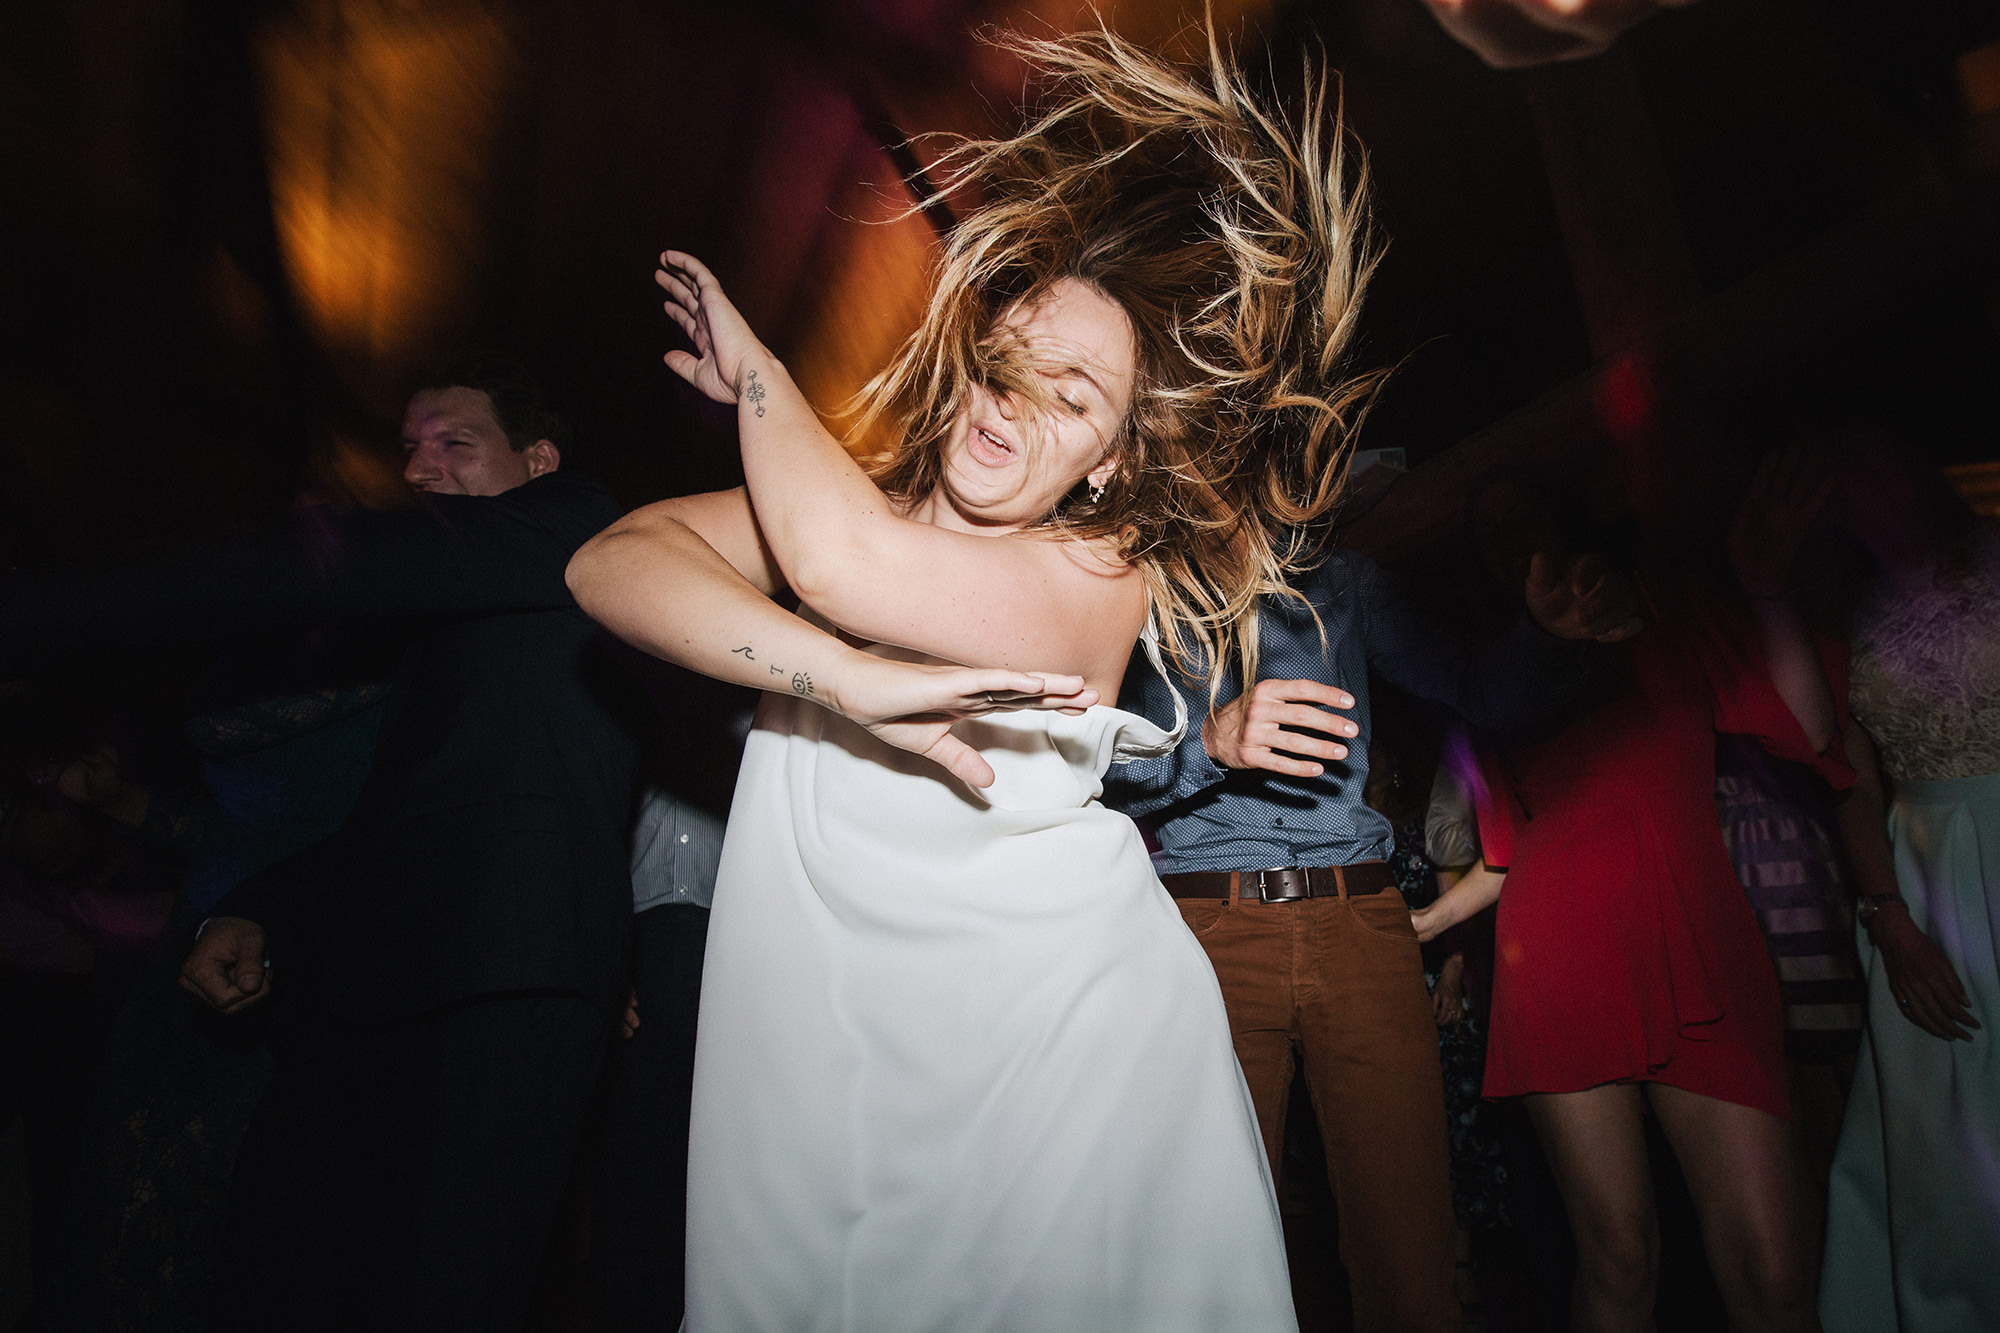 Wedding_megeve_fermes_de_marie_melanie+romain_neupapphotography-963.jpg